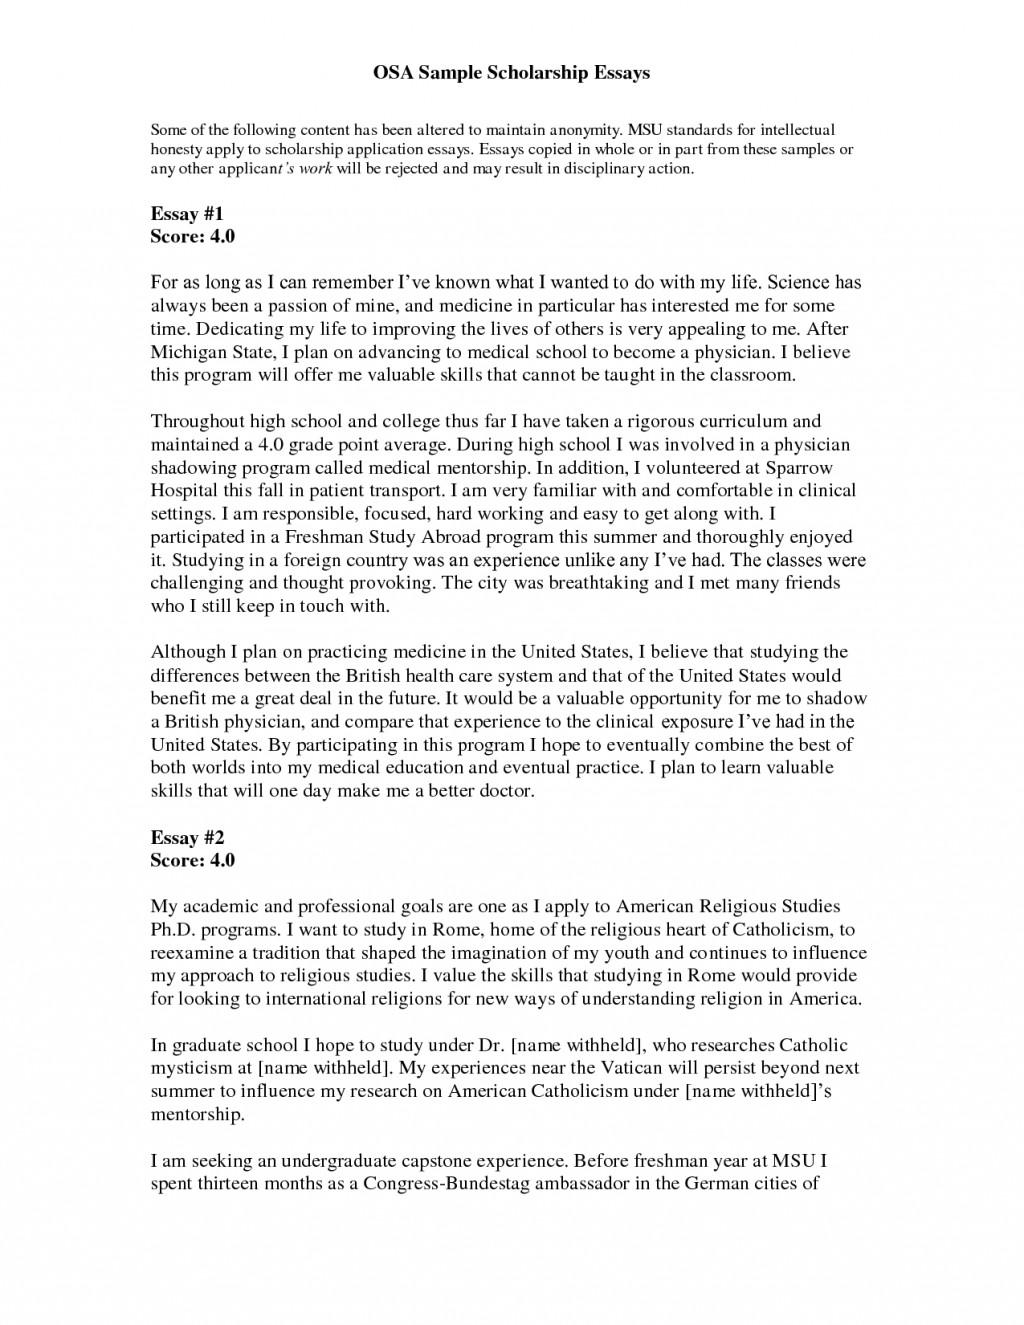 019 Scholarships For Writing Essays Scholarship Essay Writer How To Apply Texas Topics 9axjh Dreaded B Examples A 2017 C Large